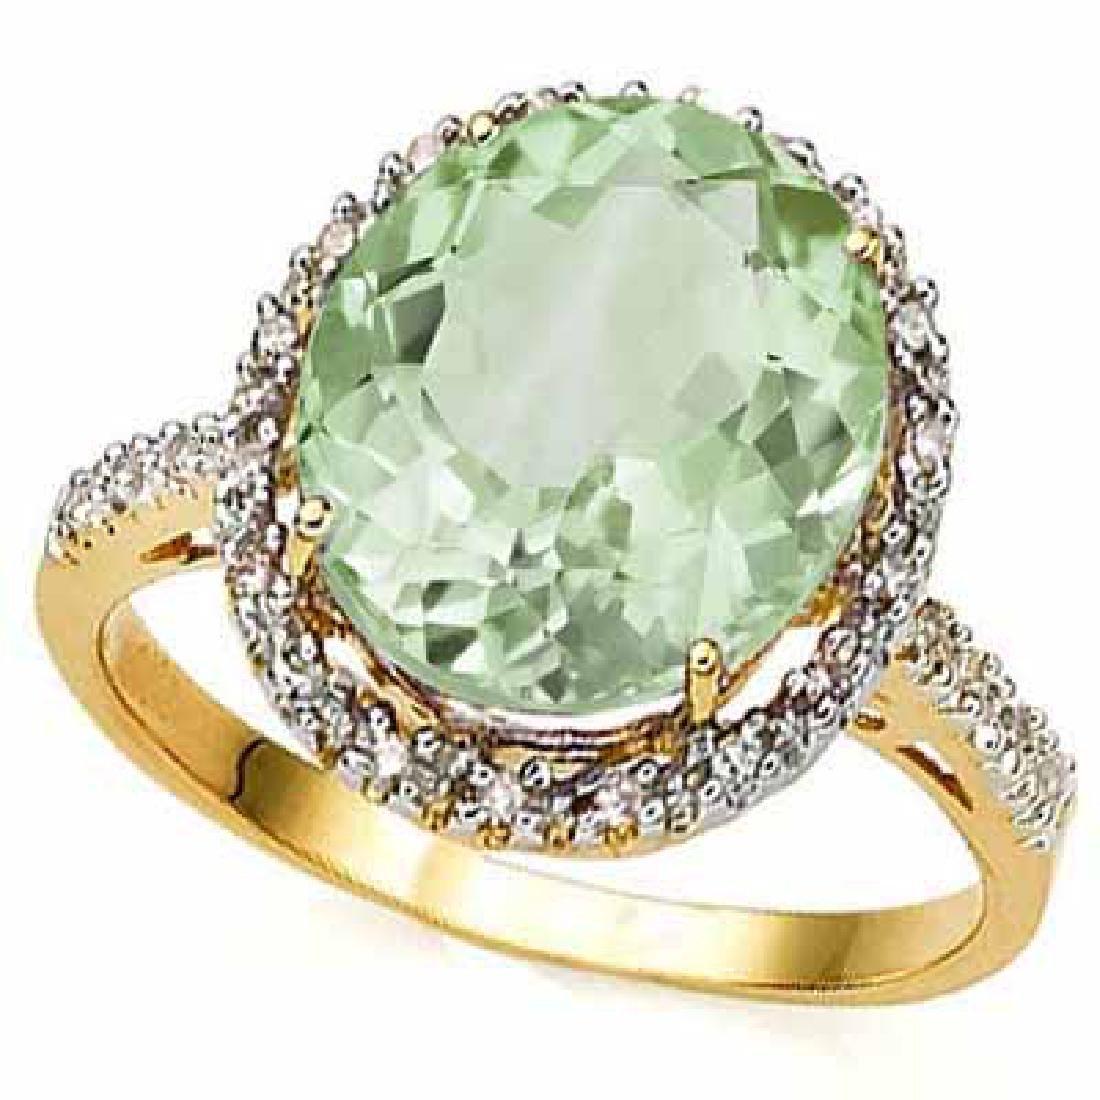 4.3 CARAT TW (23 PCS) GREEN AMETHYST & GENUINE DIAMOND